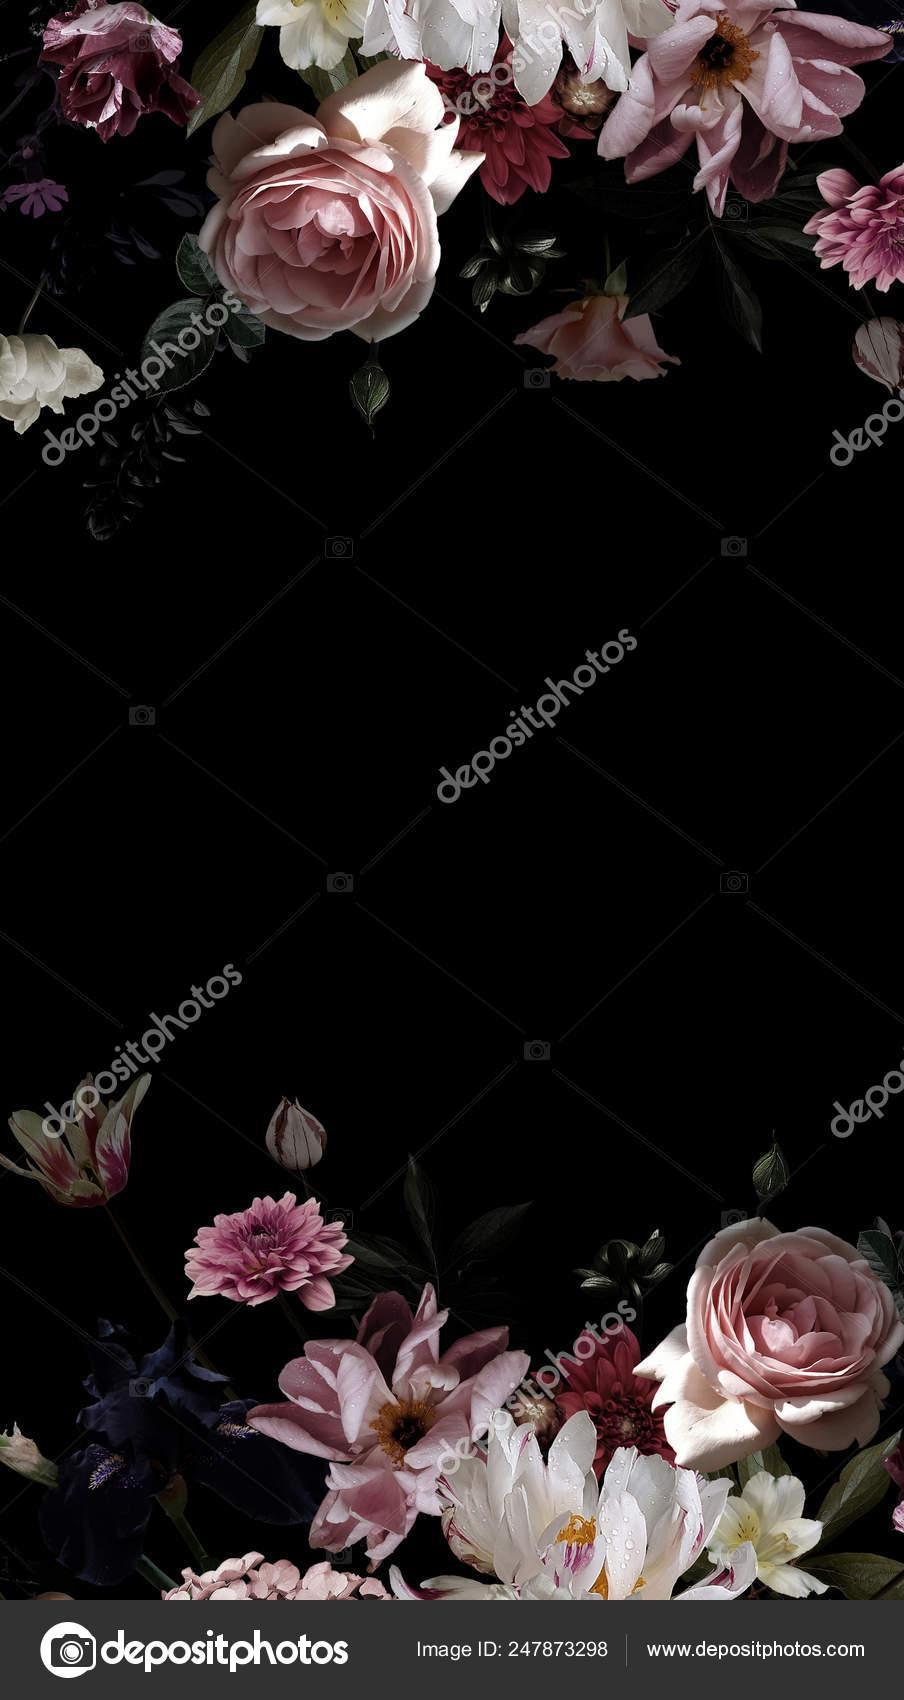 Garden Flowers Floral Decoration Black Background Text Frame